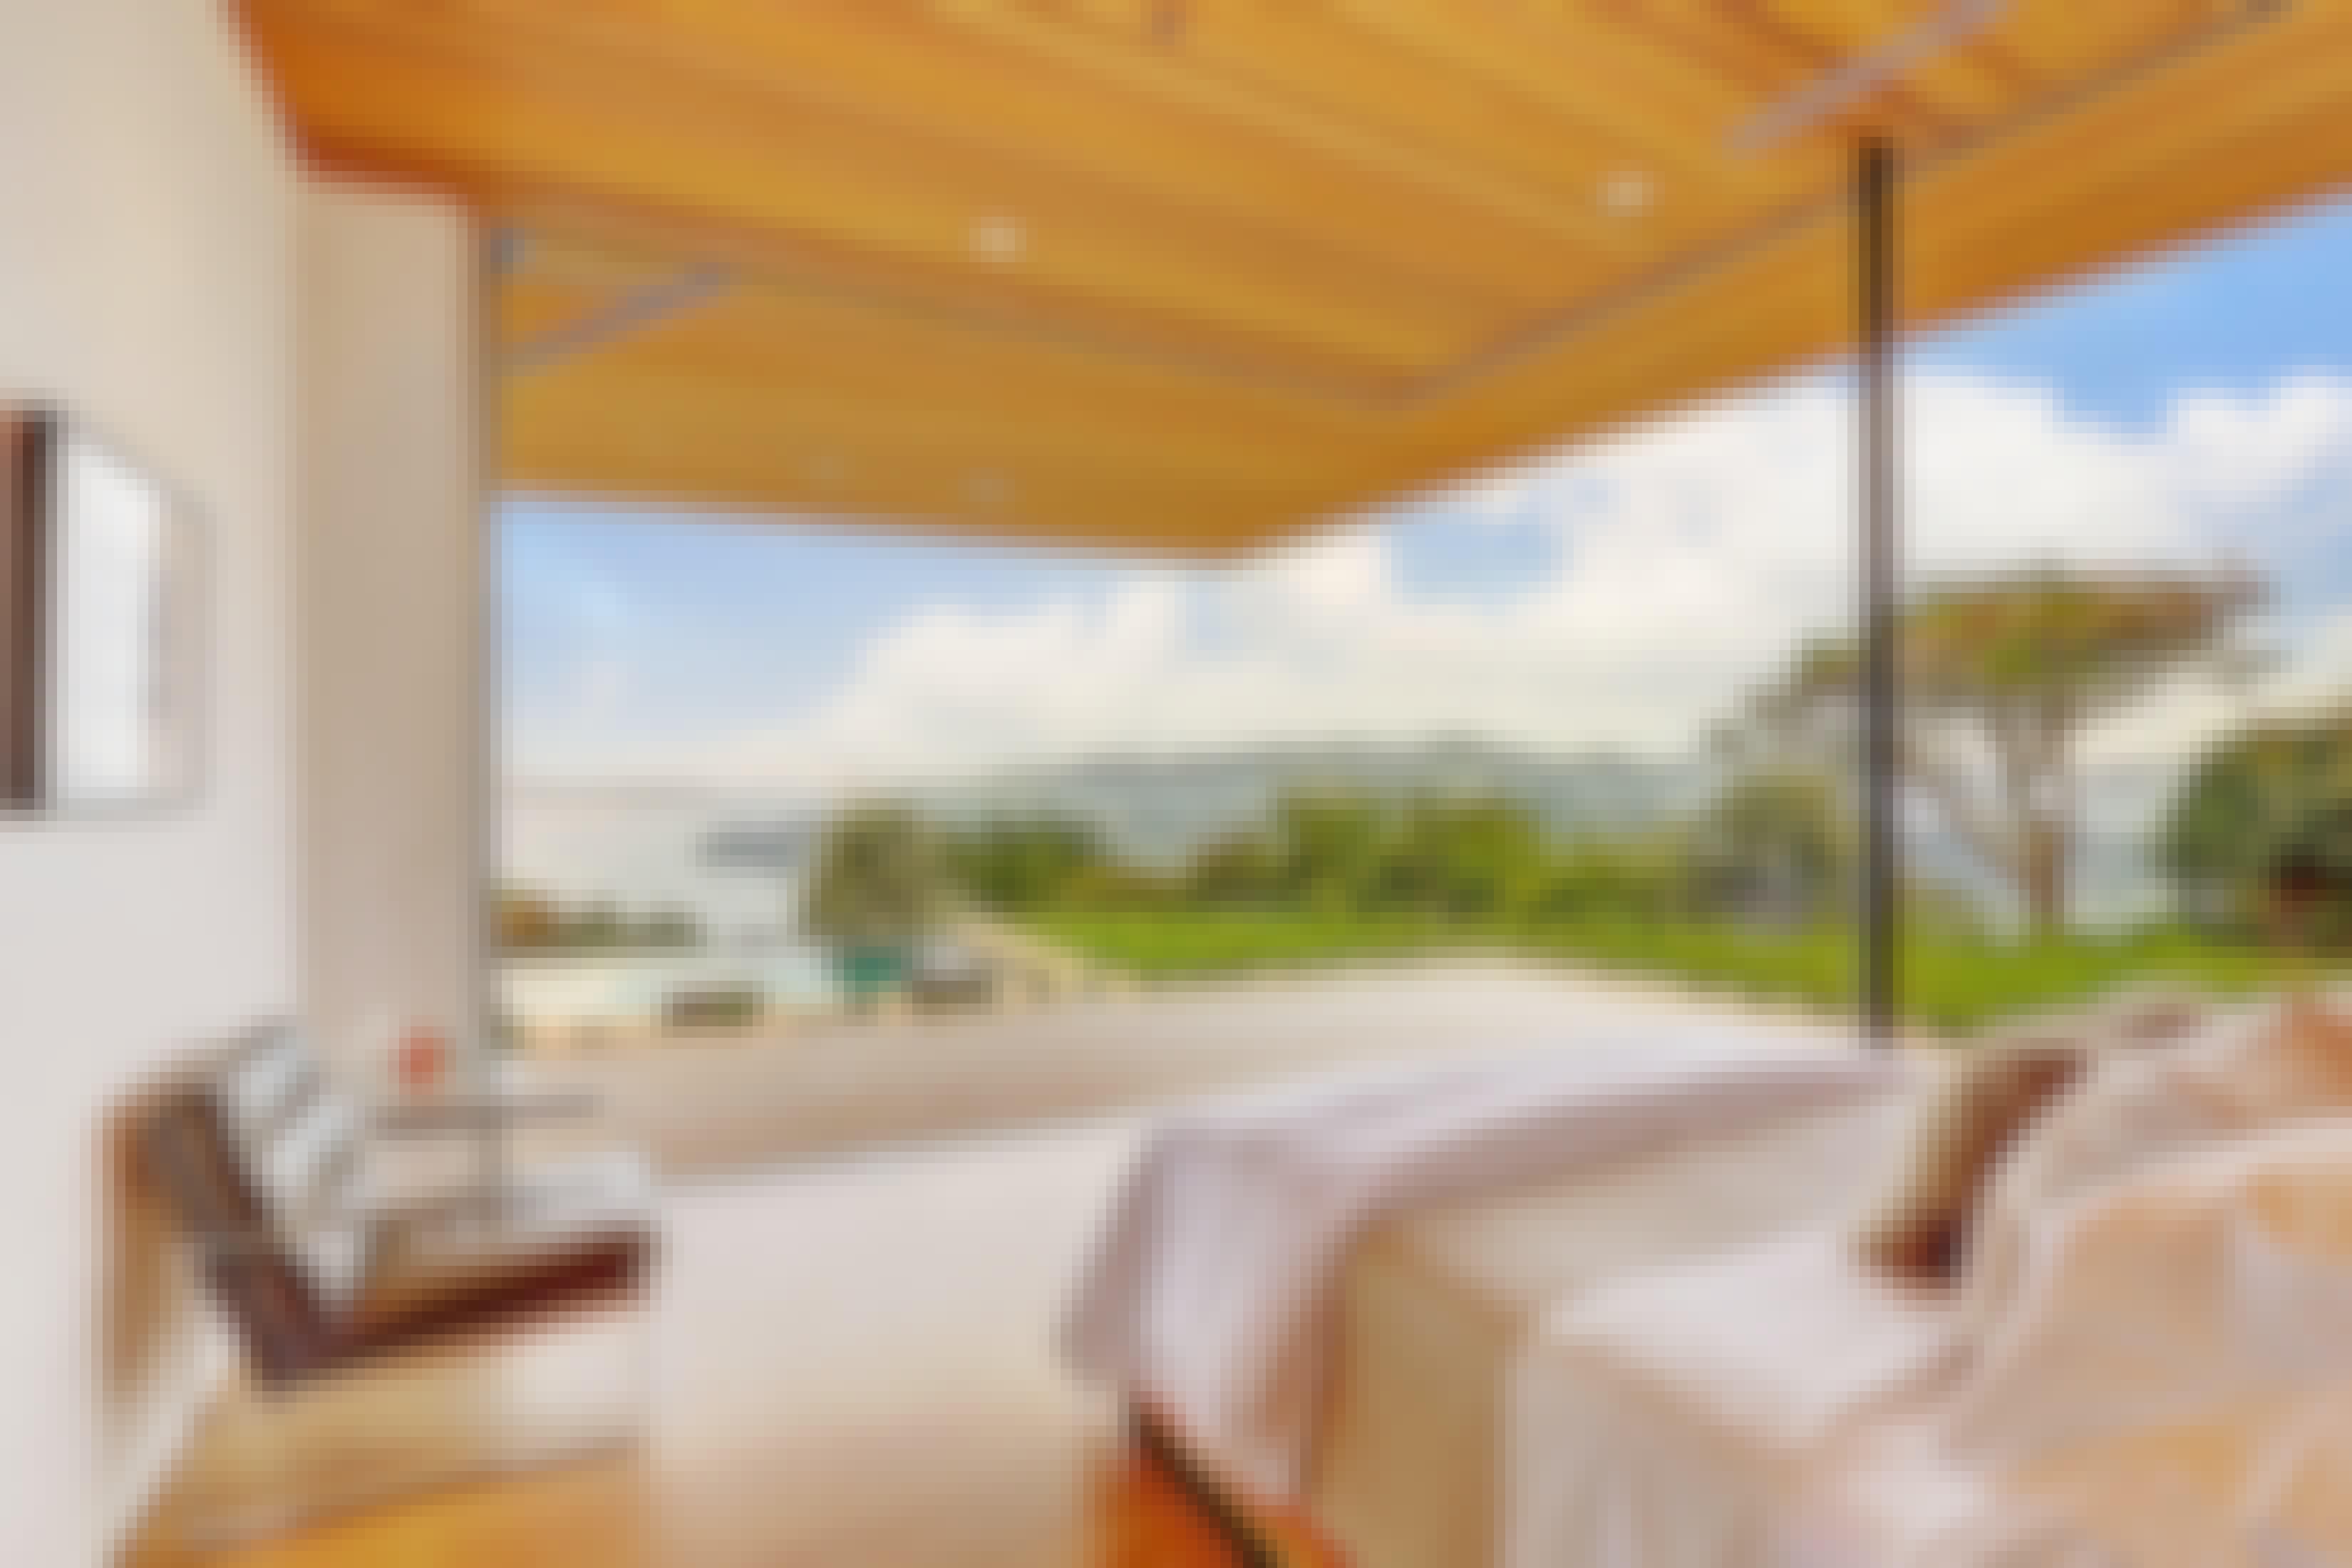 opening-glass-walls-in-bedroom-providing-ocean-view